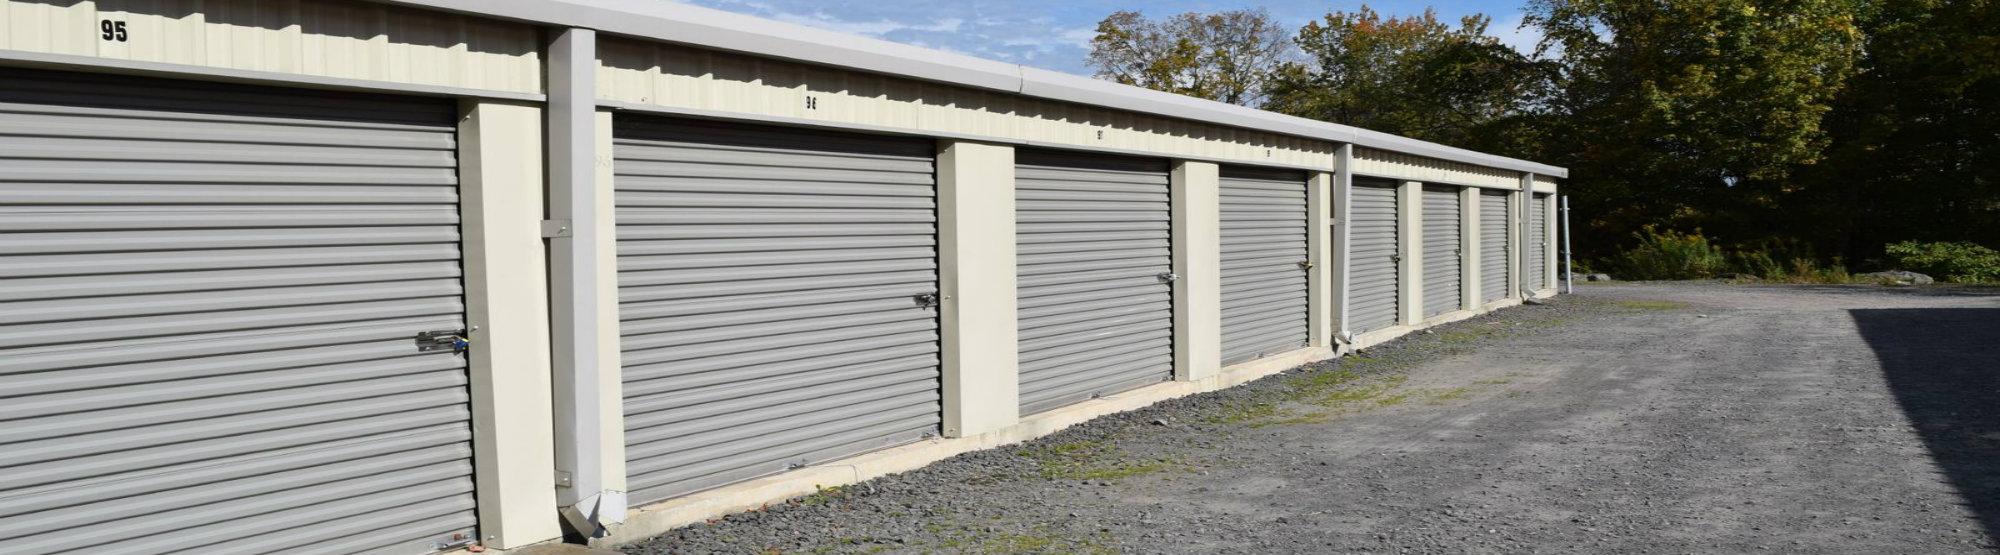 Drive up storage units in Waymart, PA